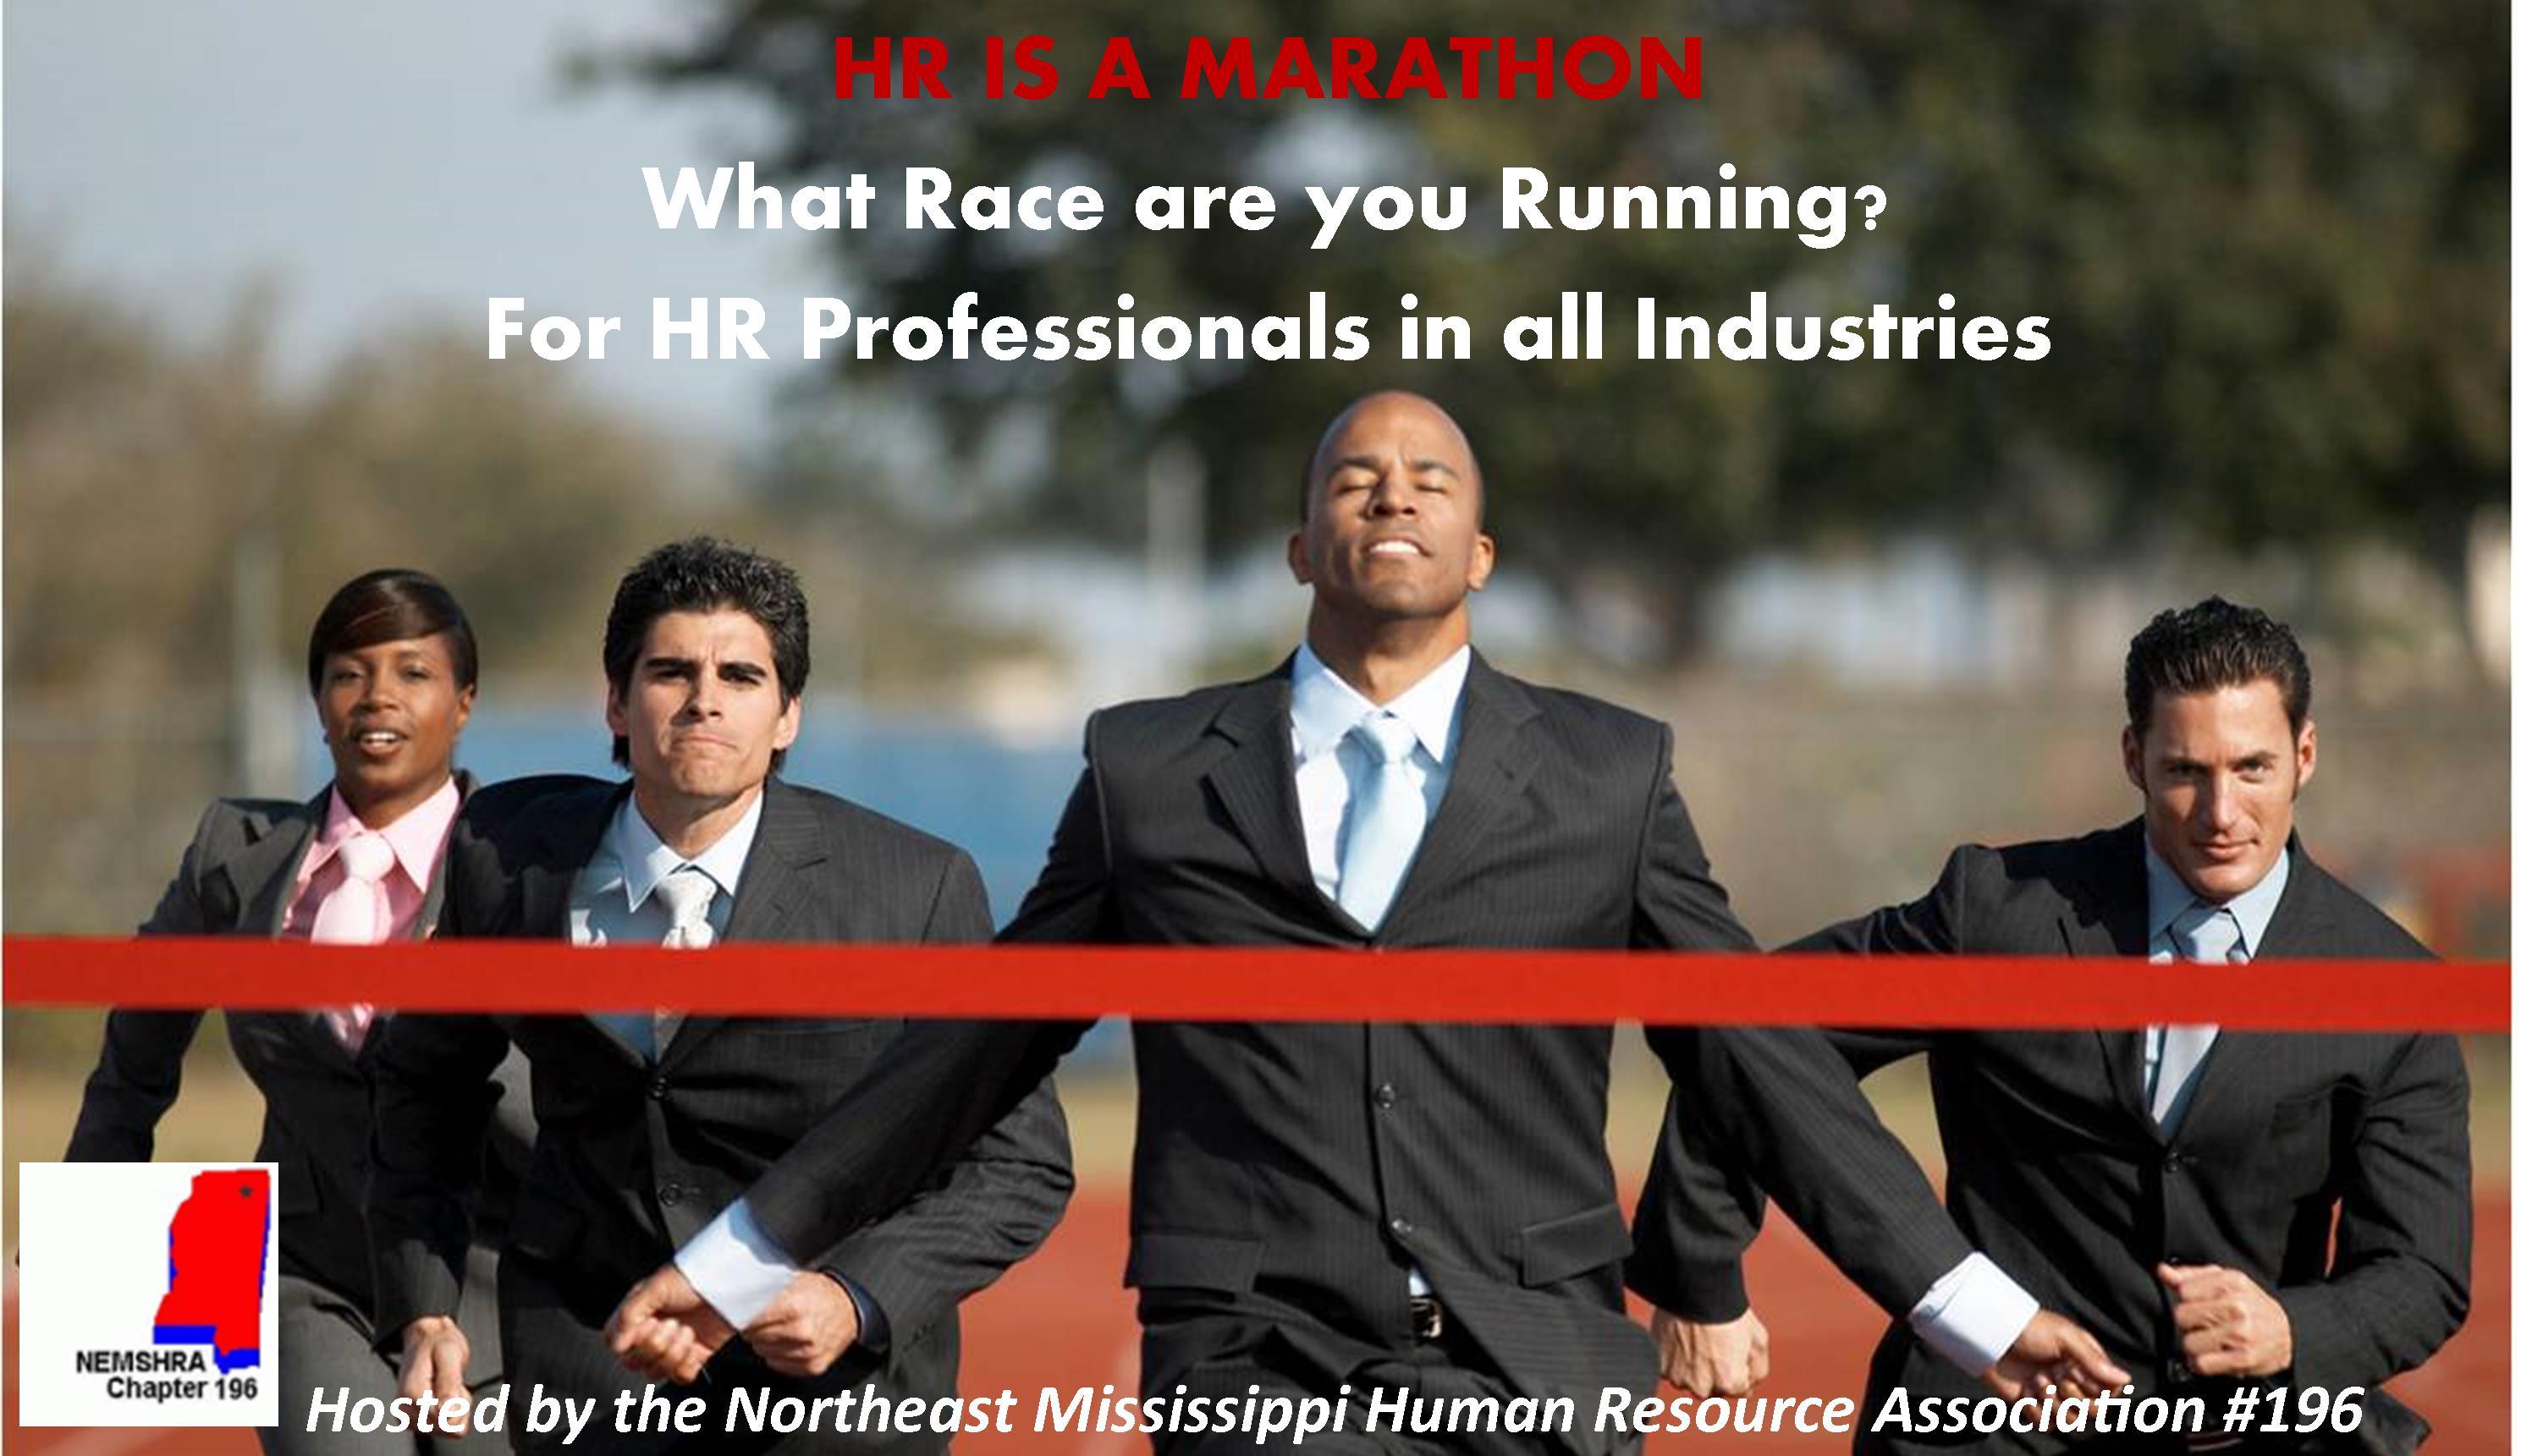 Northeast Mississippi Human Resource Association #196      -    3rd Annual Regional Human Resource Seminar